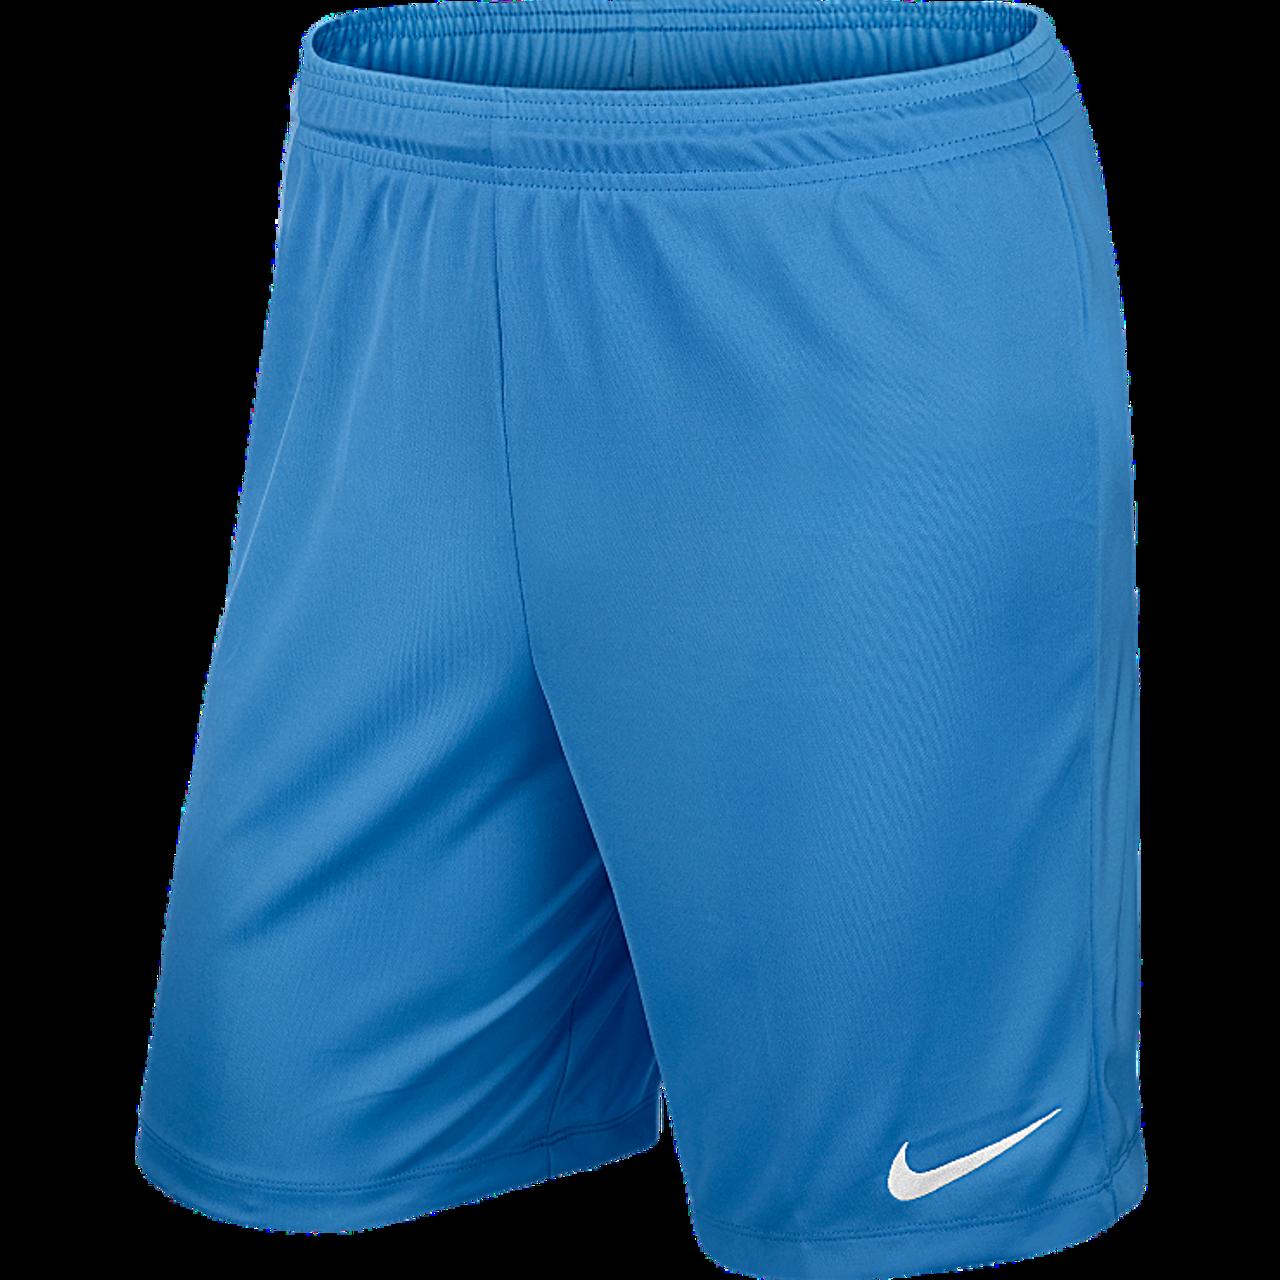 Womens Nike Park II Knit Football Shorts Dri Fit Gym Activewear XS-XL